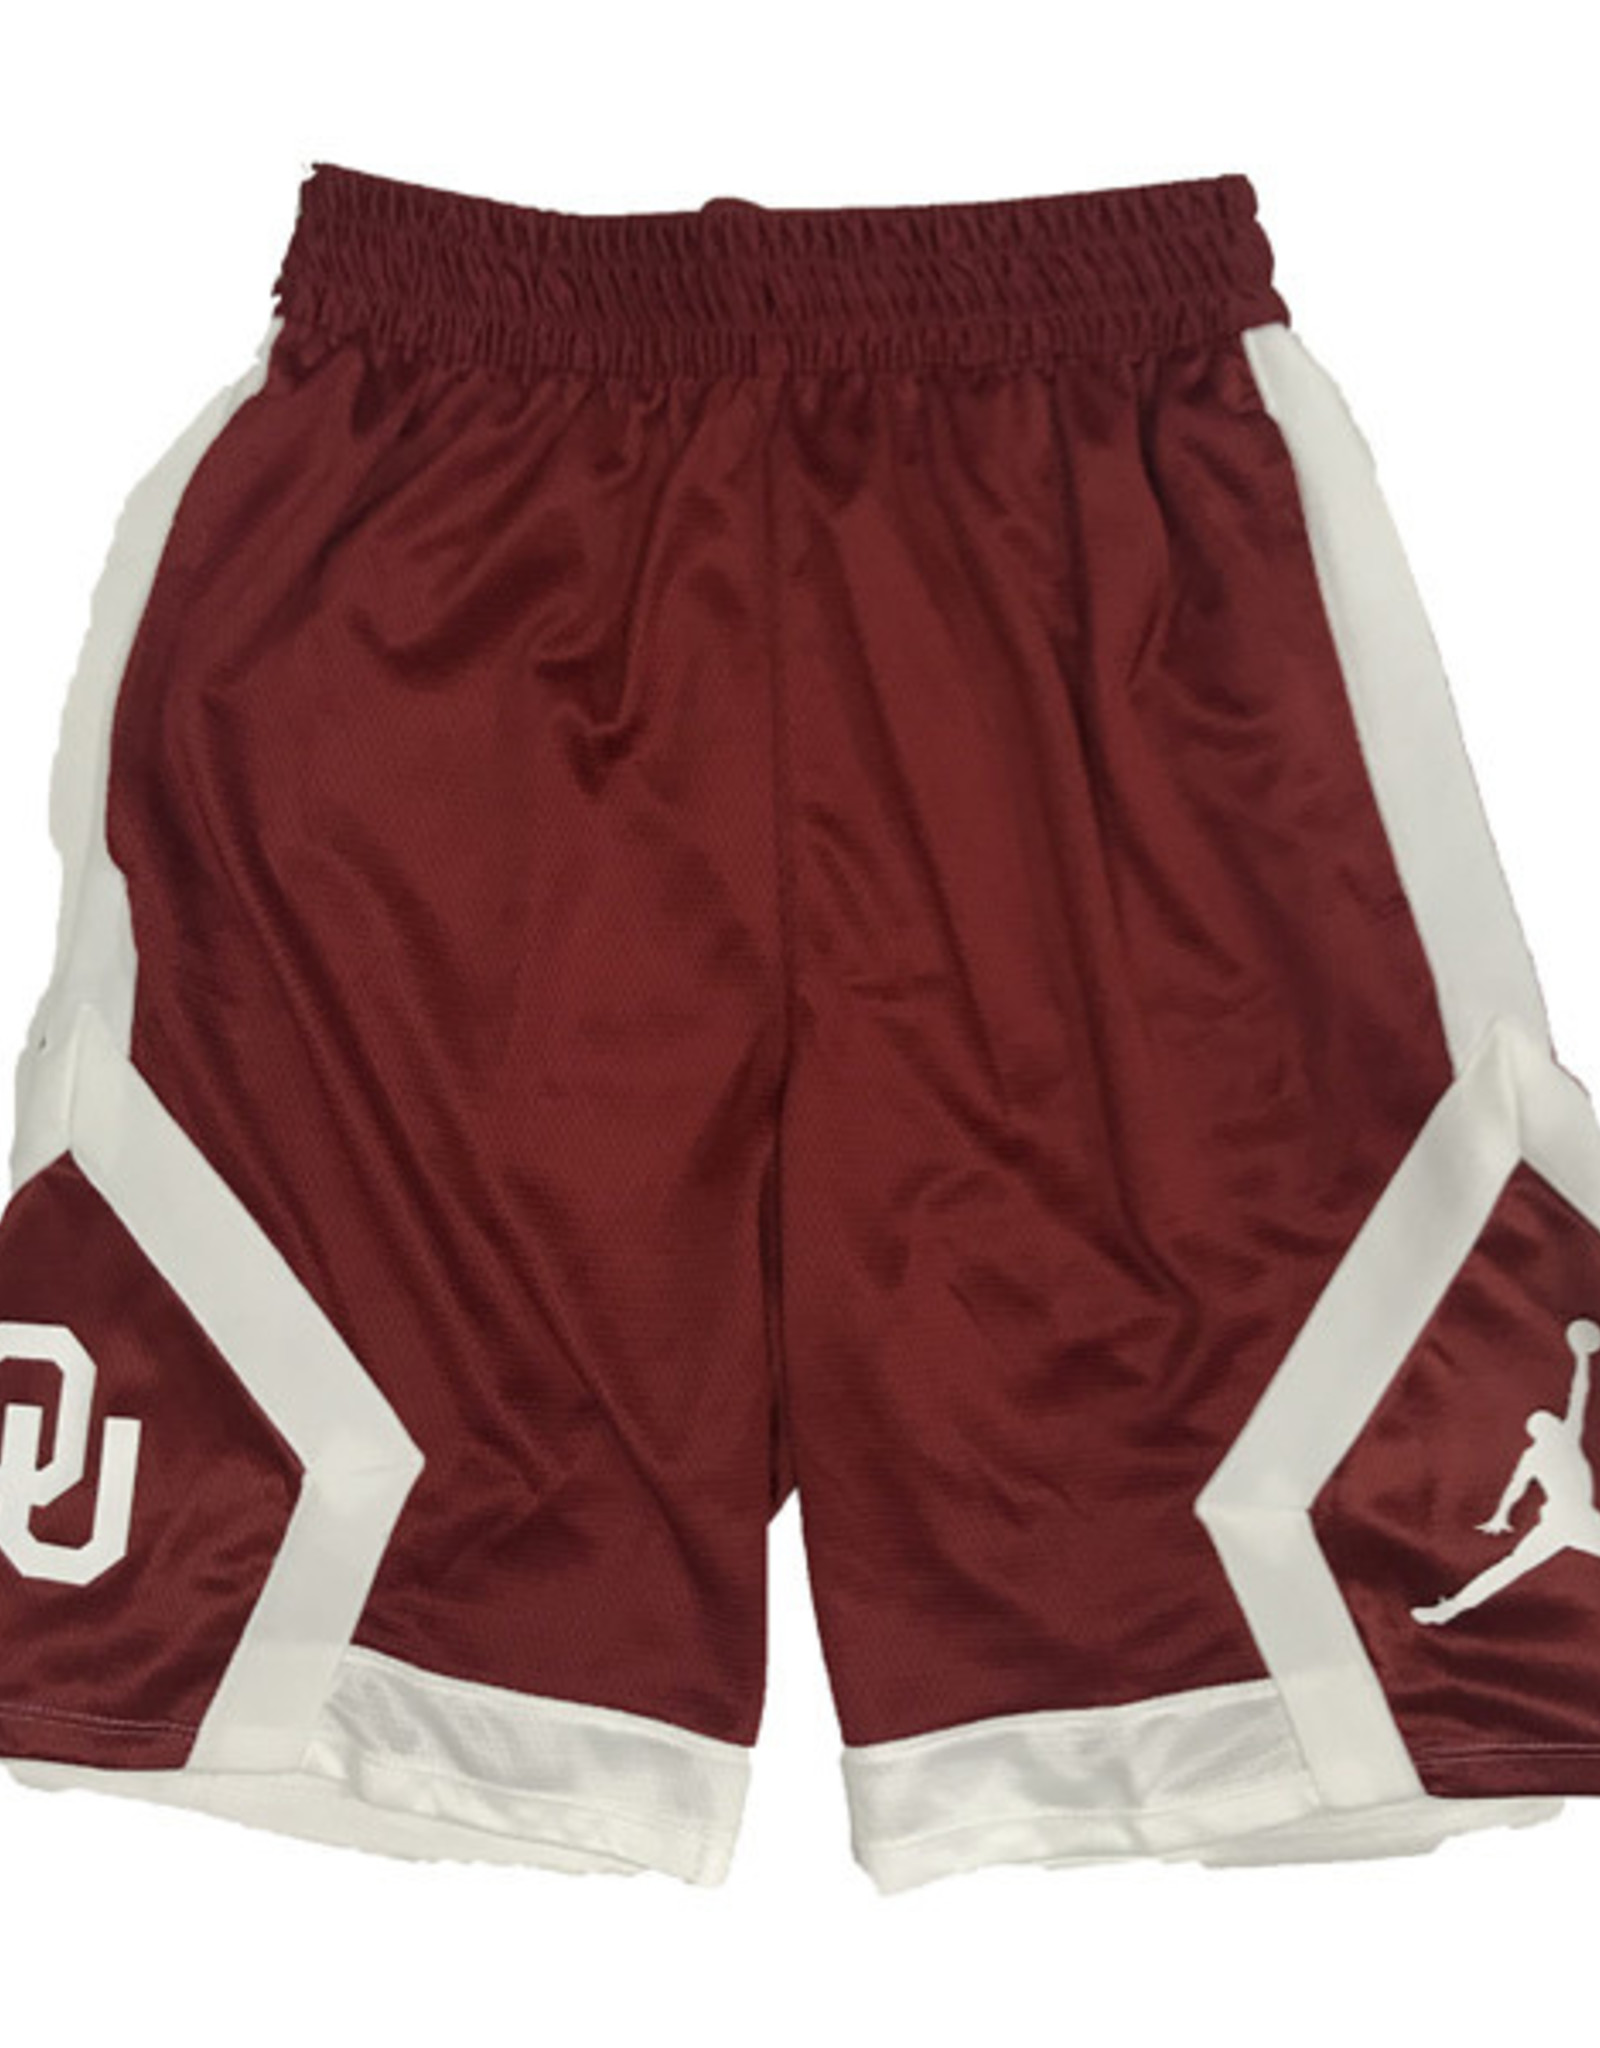 Jordan Men's Jordan Brand Oklahoma J Knit Short